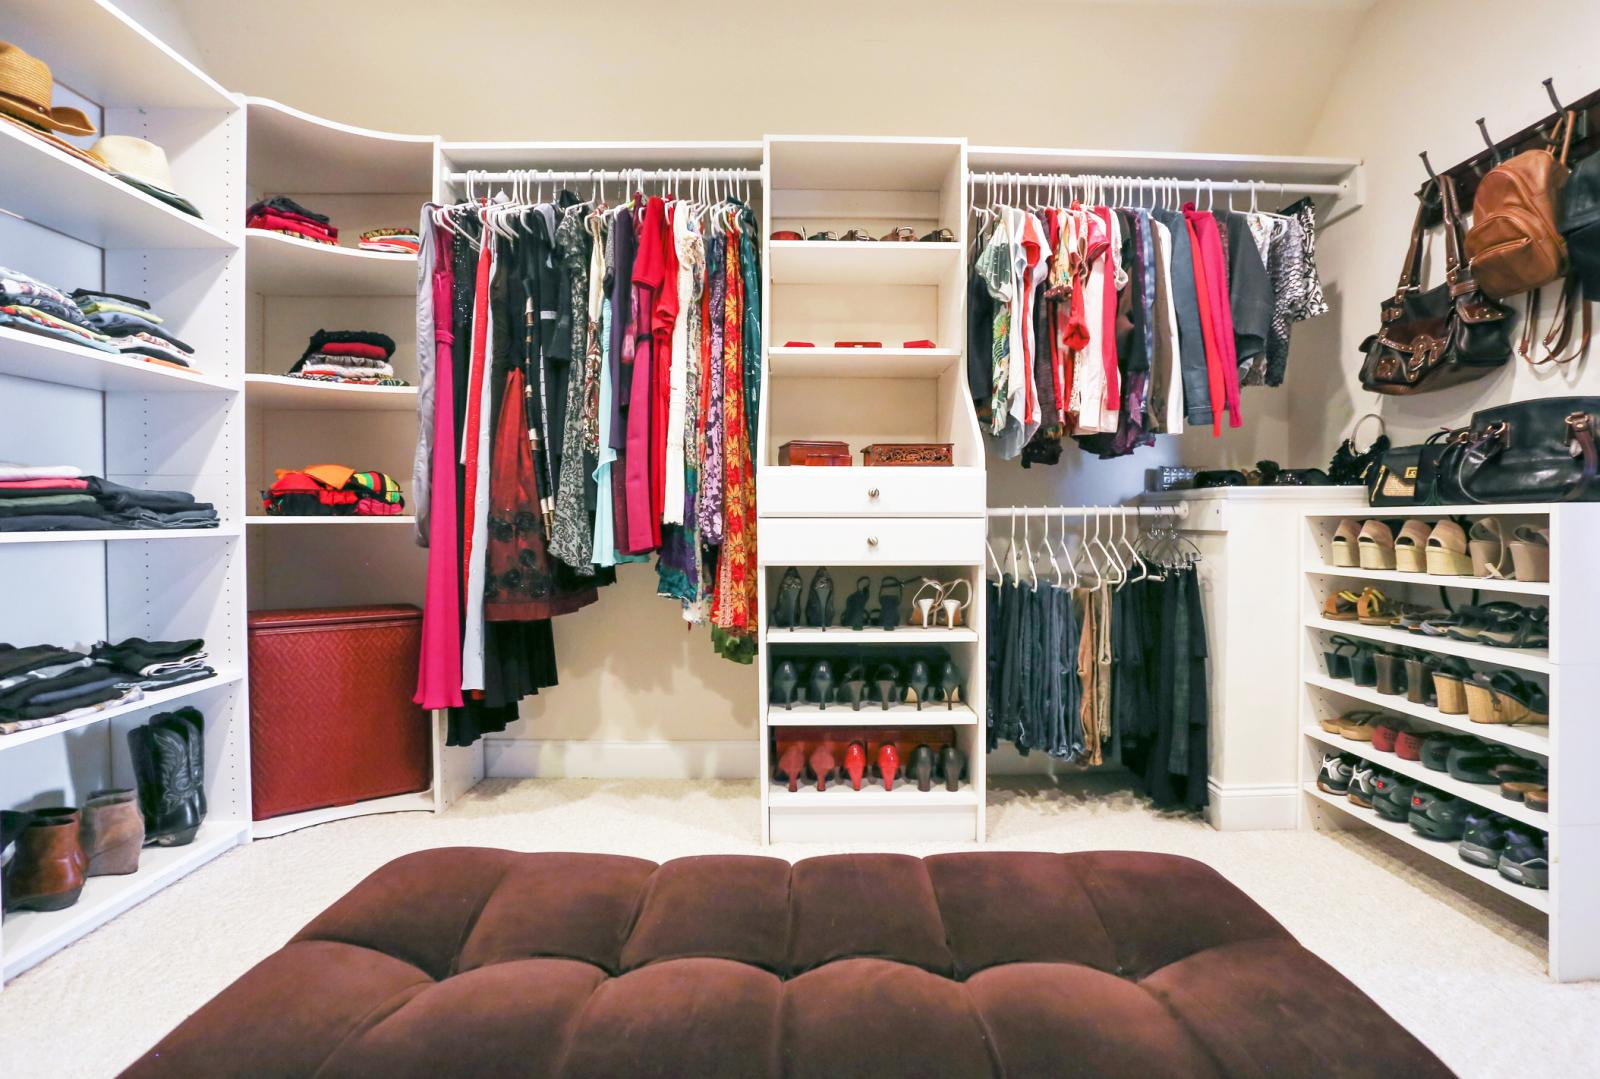 Fully organised closet